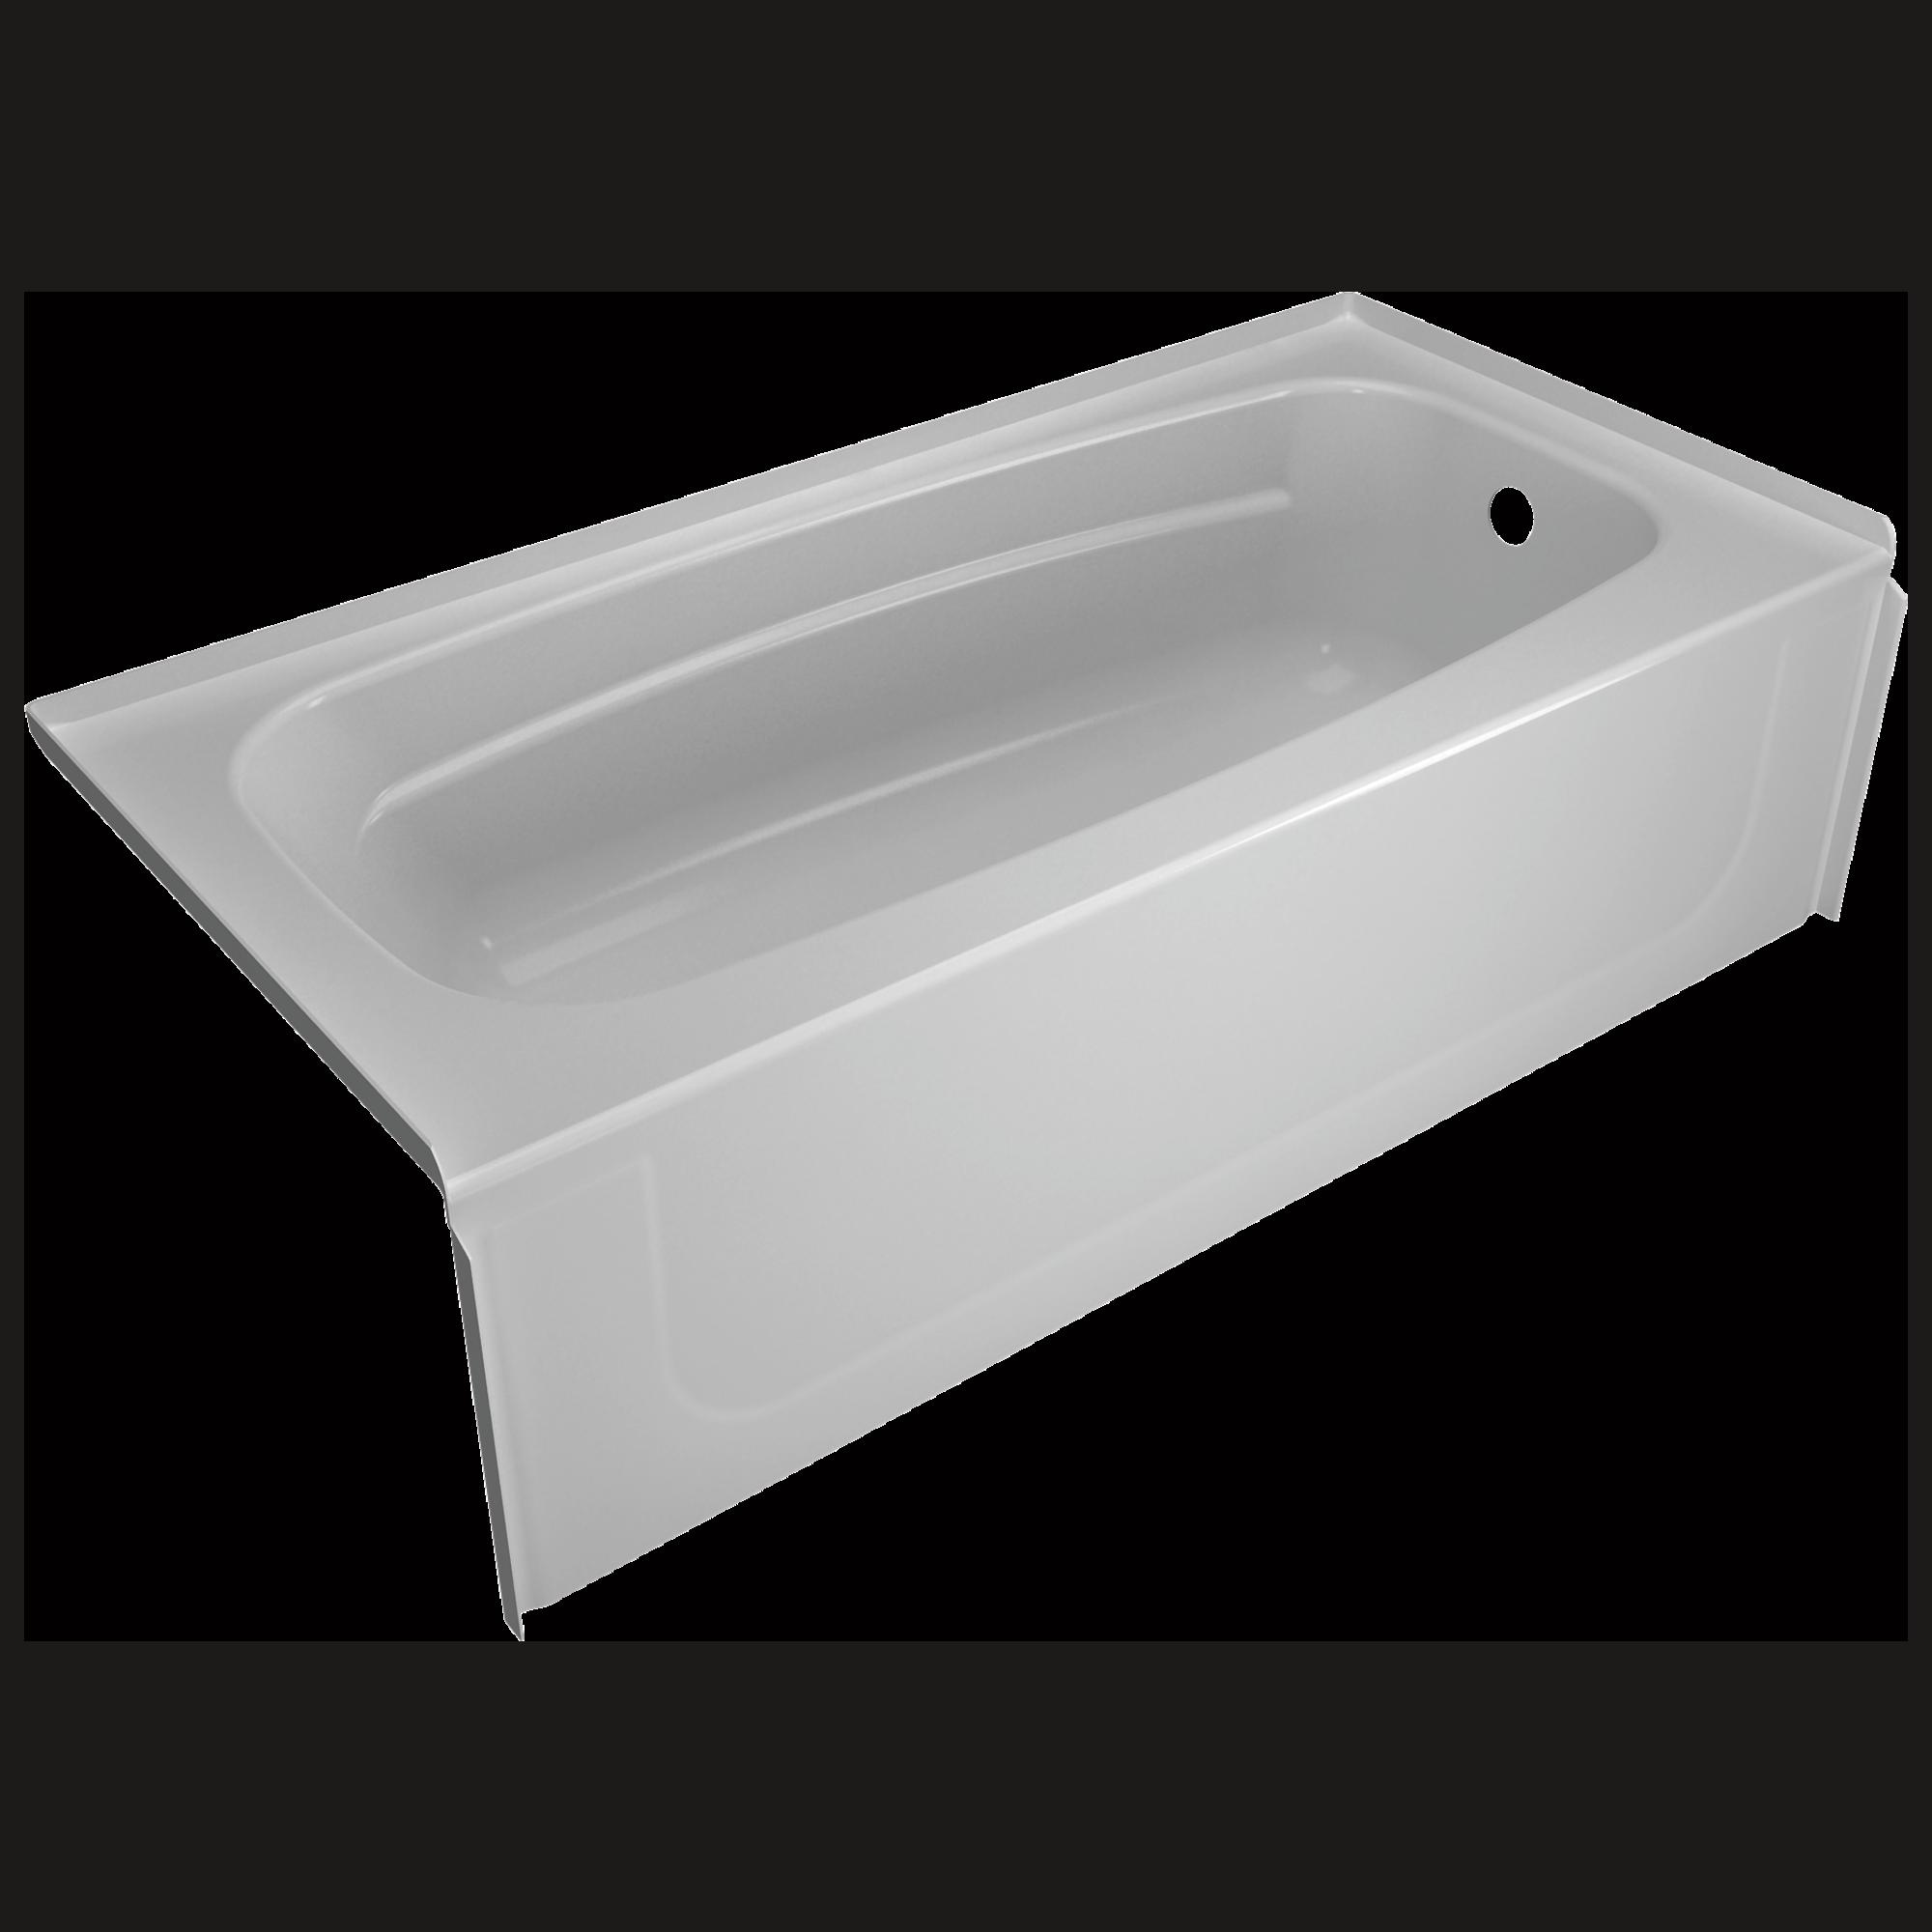 apron pdx x improvement soaking bathtub front wayfair standard studio acrylic home farmhouse farmhouseapron american